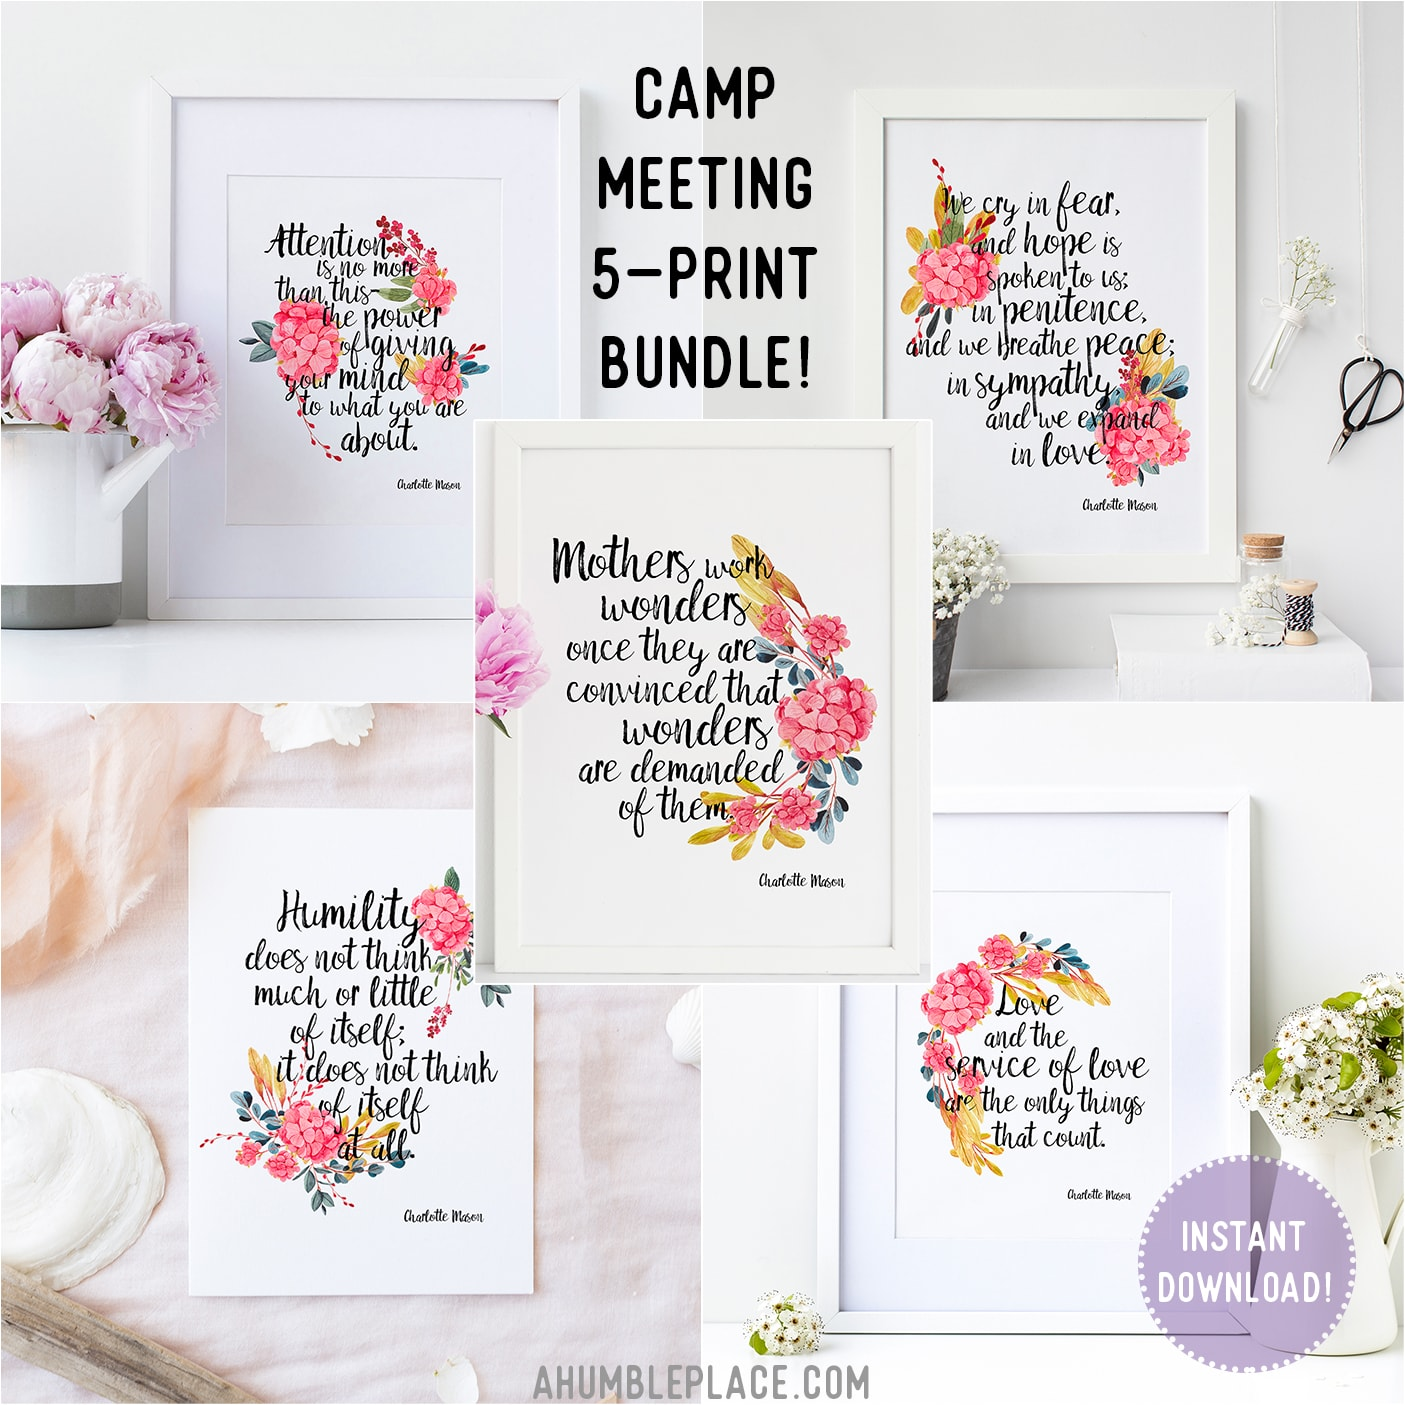 Camp Meeting 5-Print Charlotte Mason Quote Bundle! - ahumbleplace.com